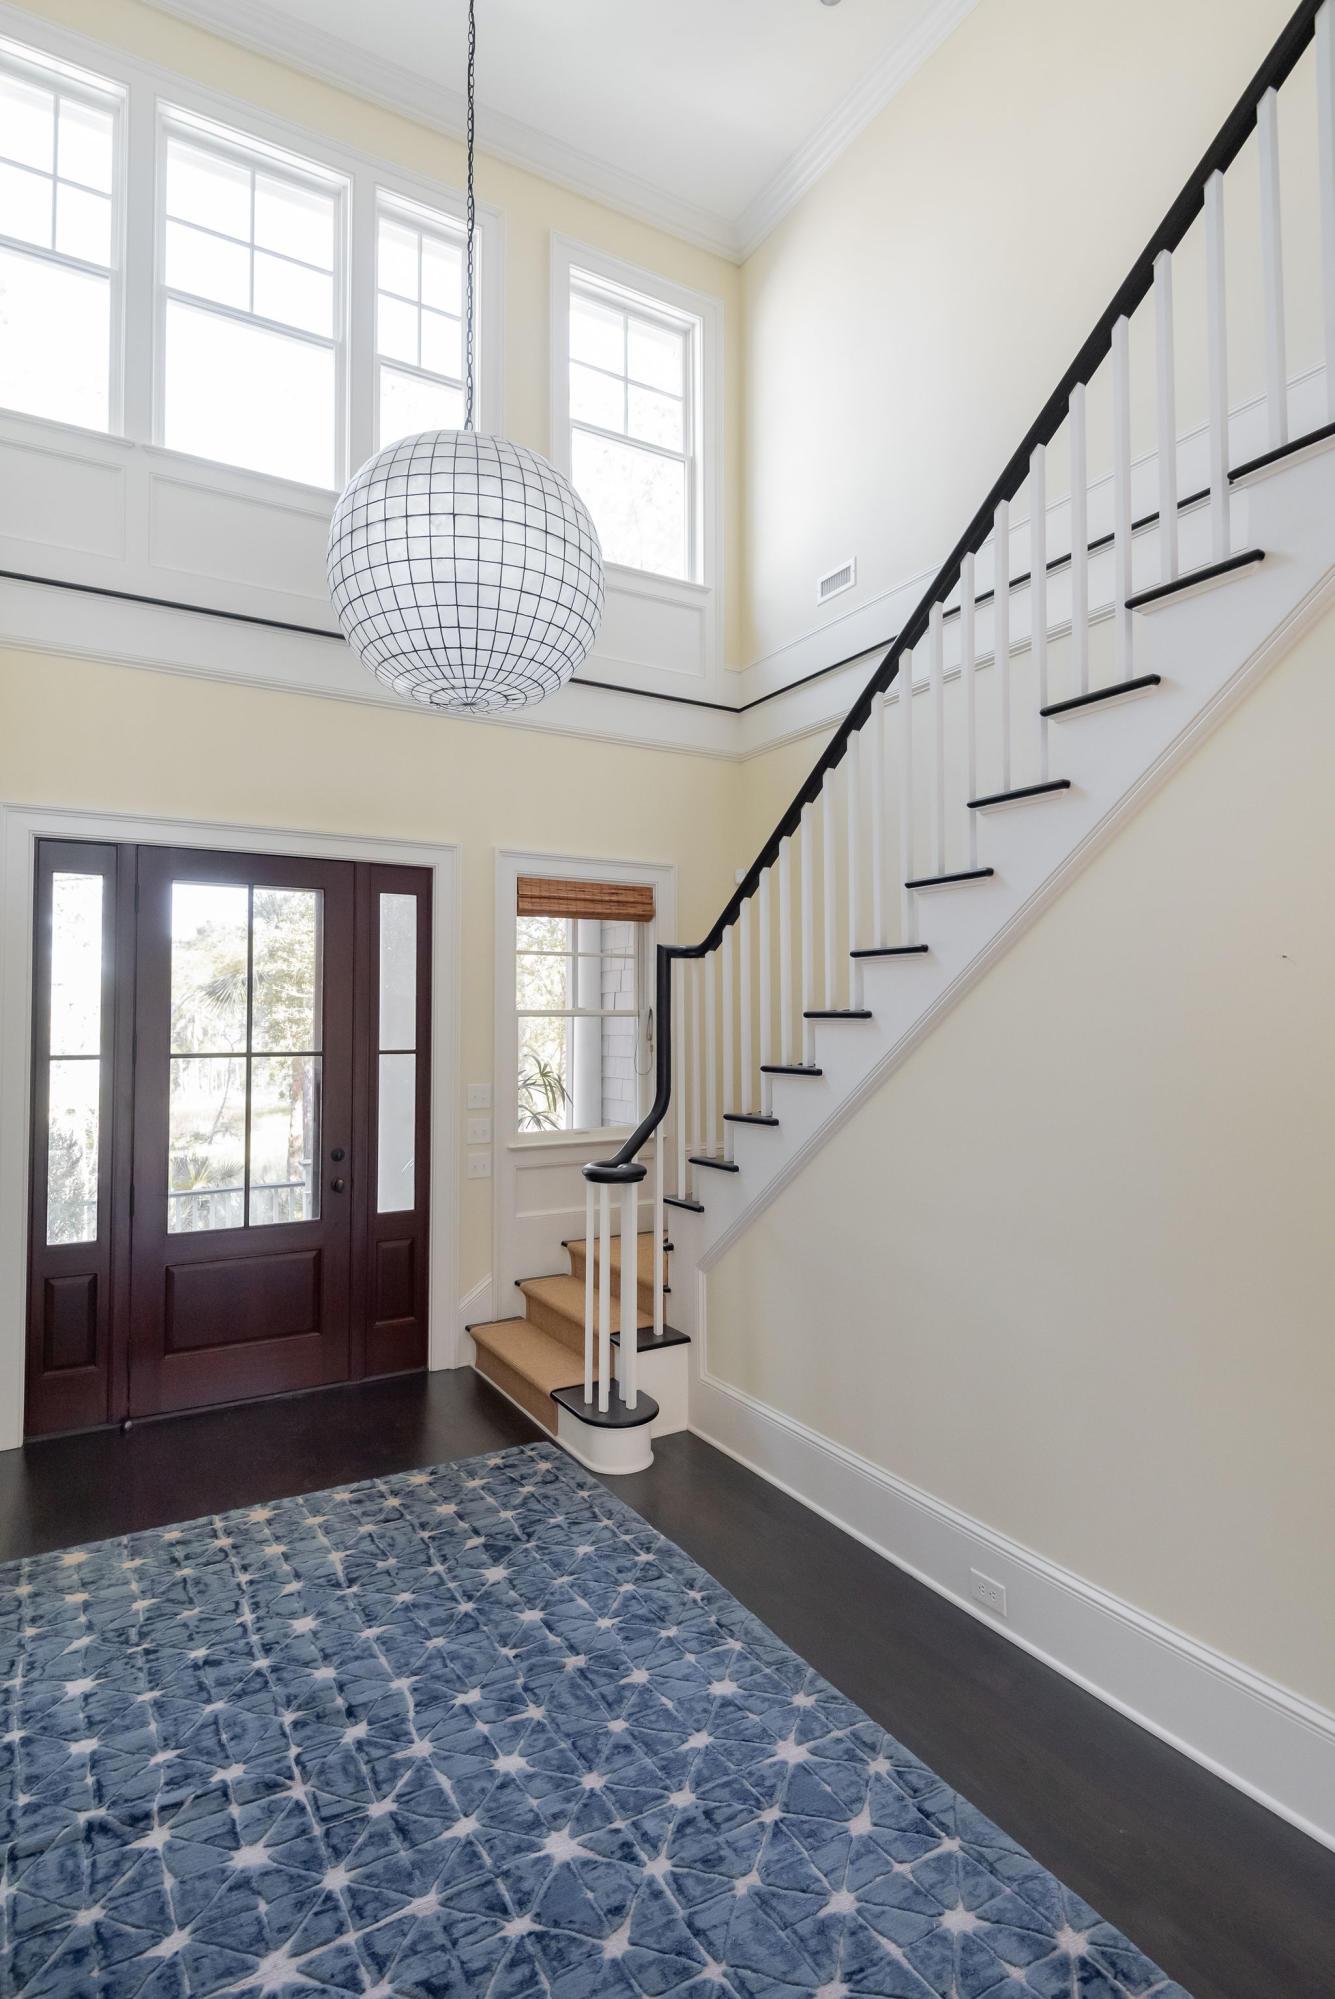 Kiawah Island Homes For Sale - 3 Grey Widgeon, Kiawah Island, SC - 24